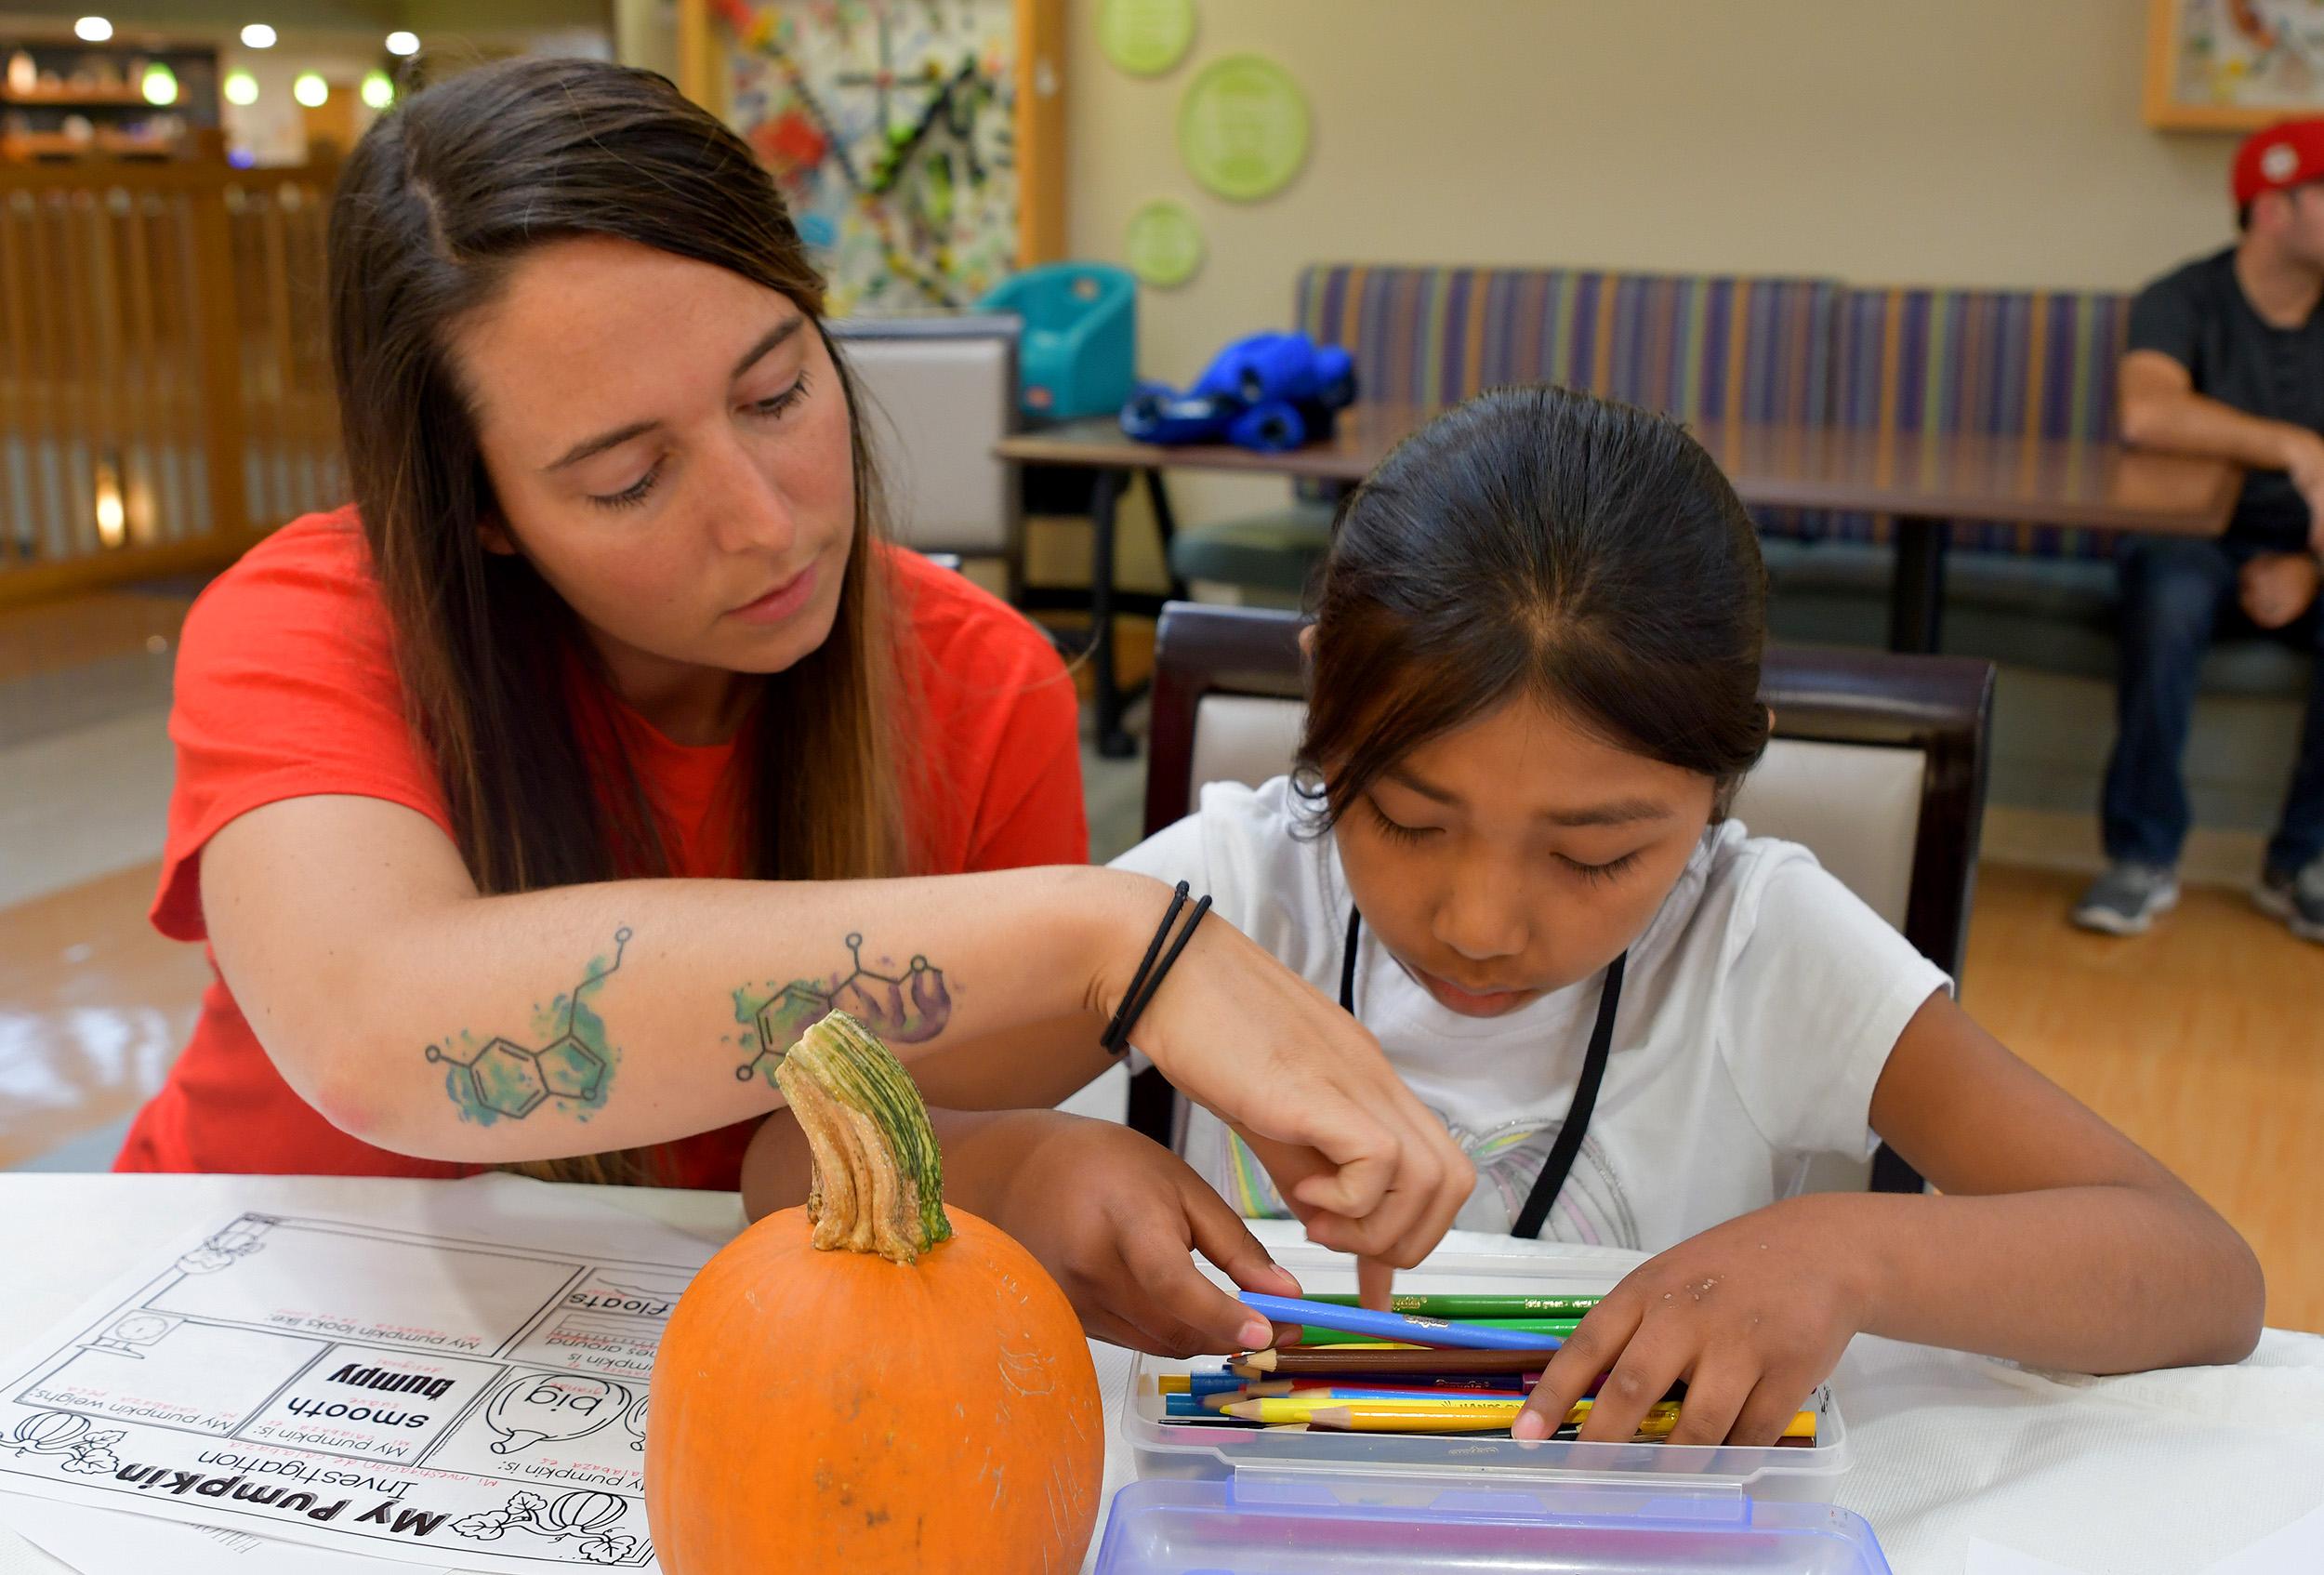 INNgineers educators teach kids at the Inn